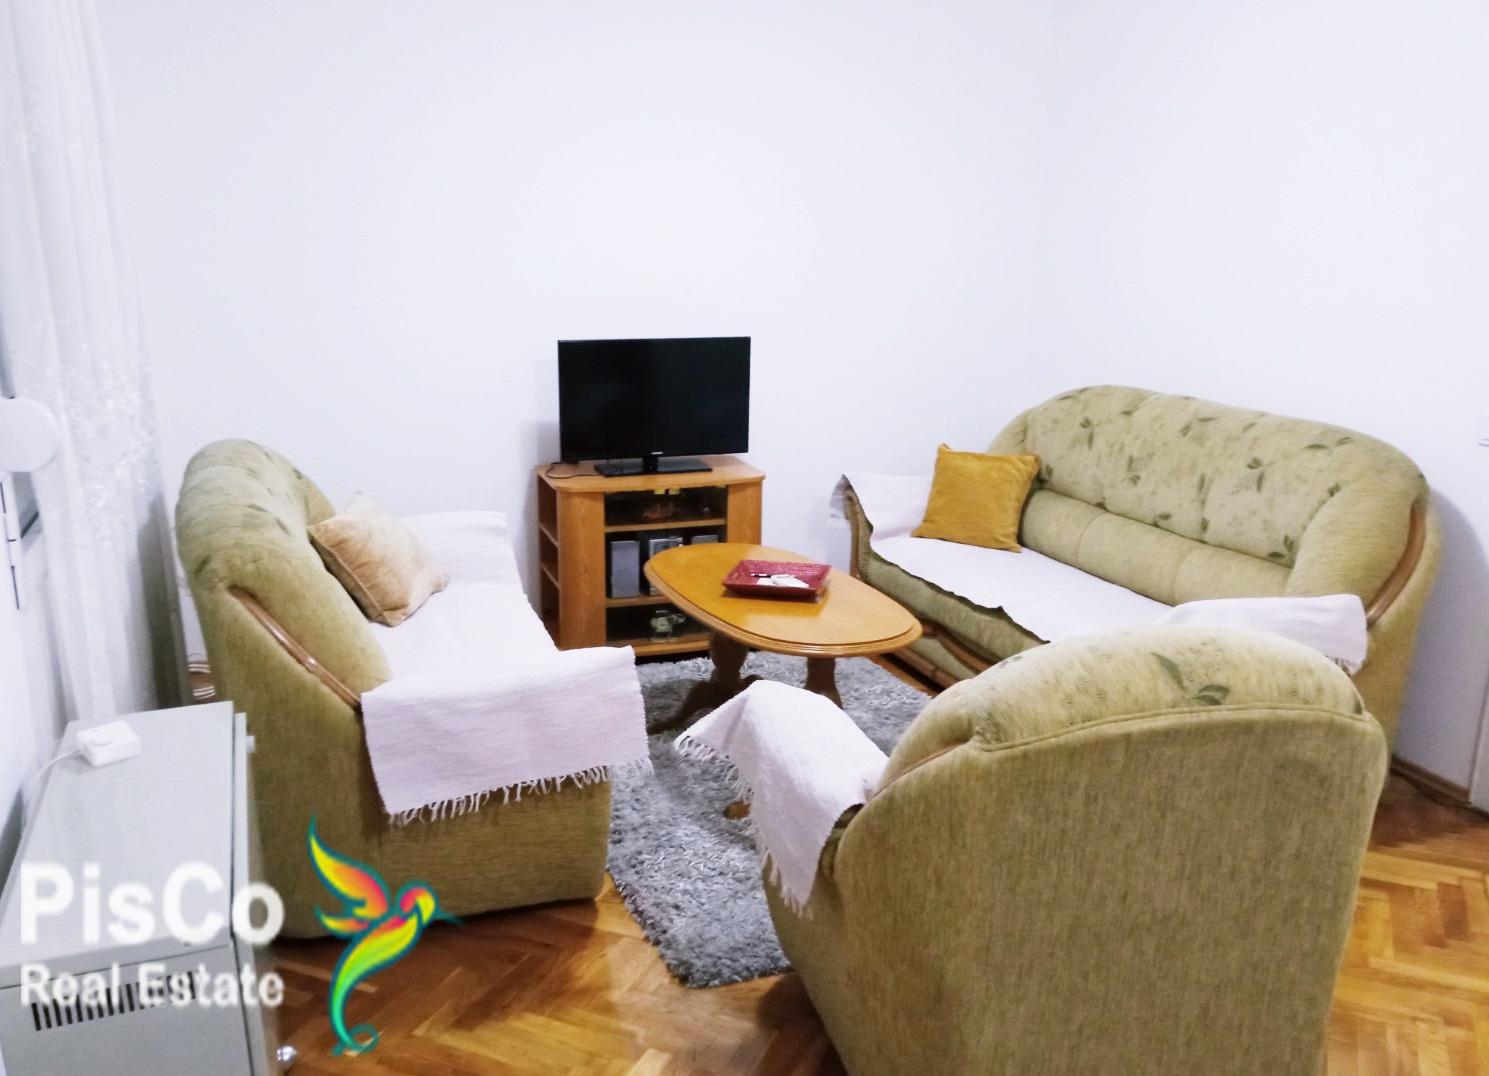 FOR RENT Two bedroom apartment Preko Morače 70m2